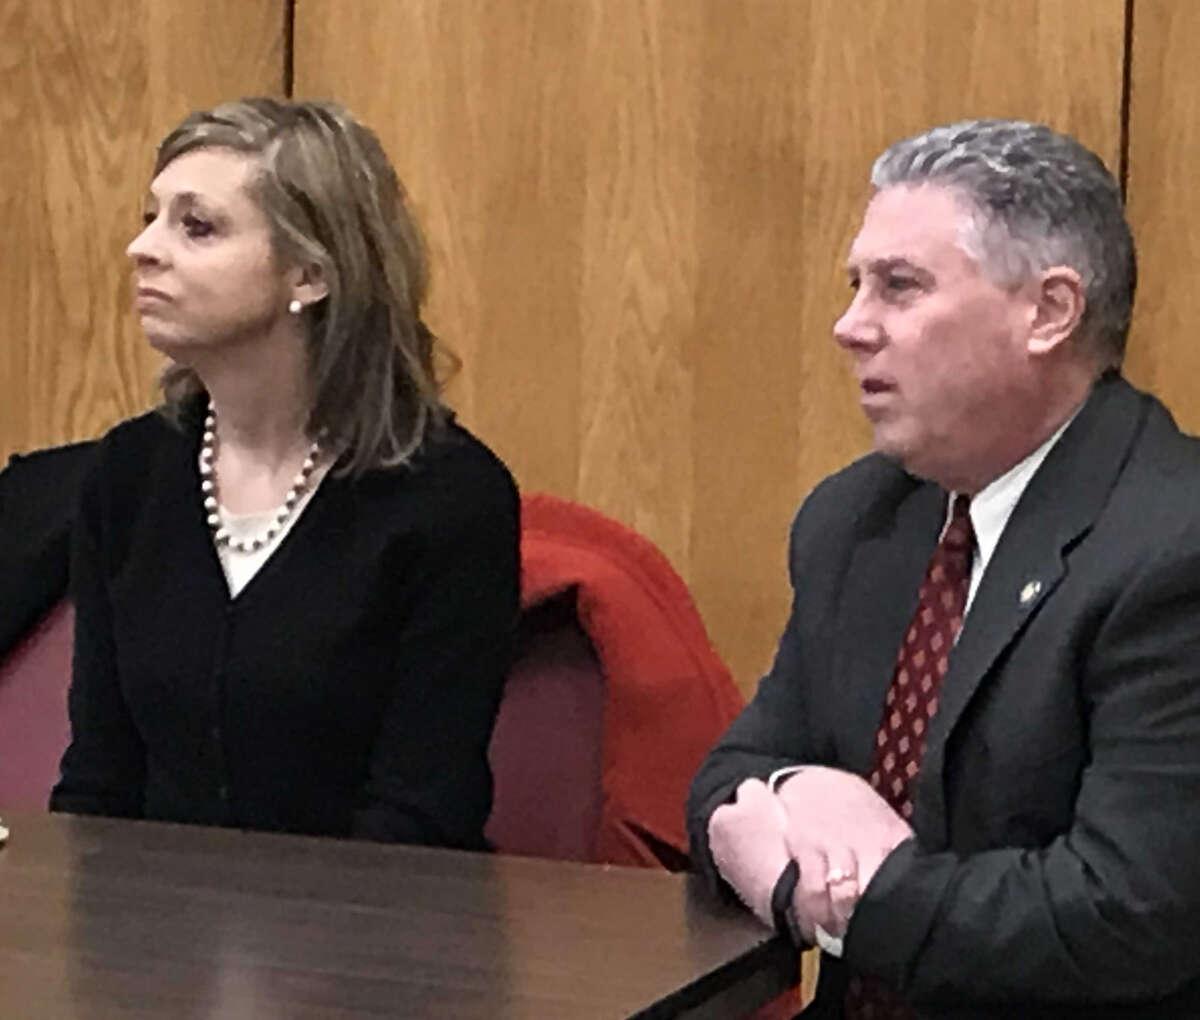 Cohoes City School District Superintendent Jennifer Spring and Assemblyman John T. McDonald III, D-Cohoes, listen at Cohoes Community Center forum Thursday.